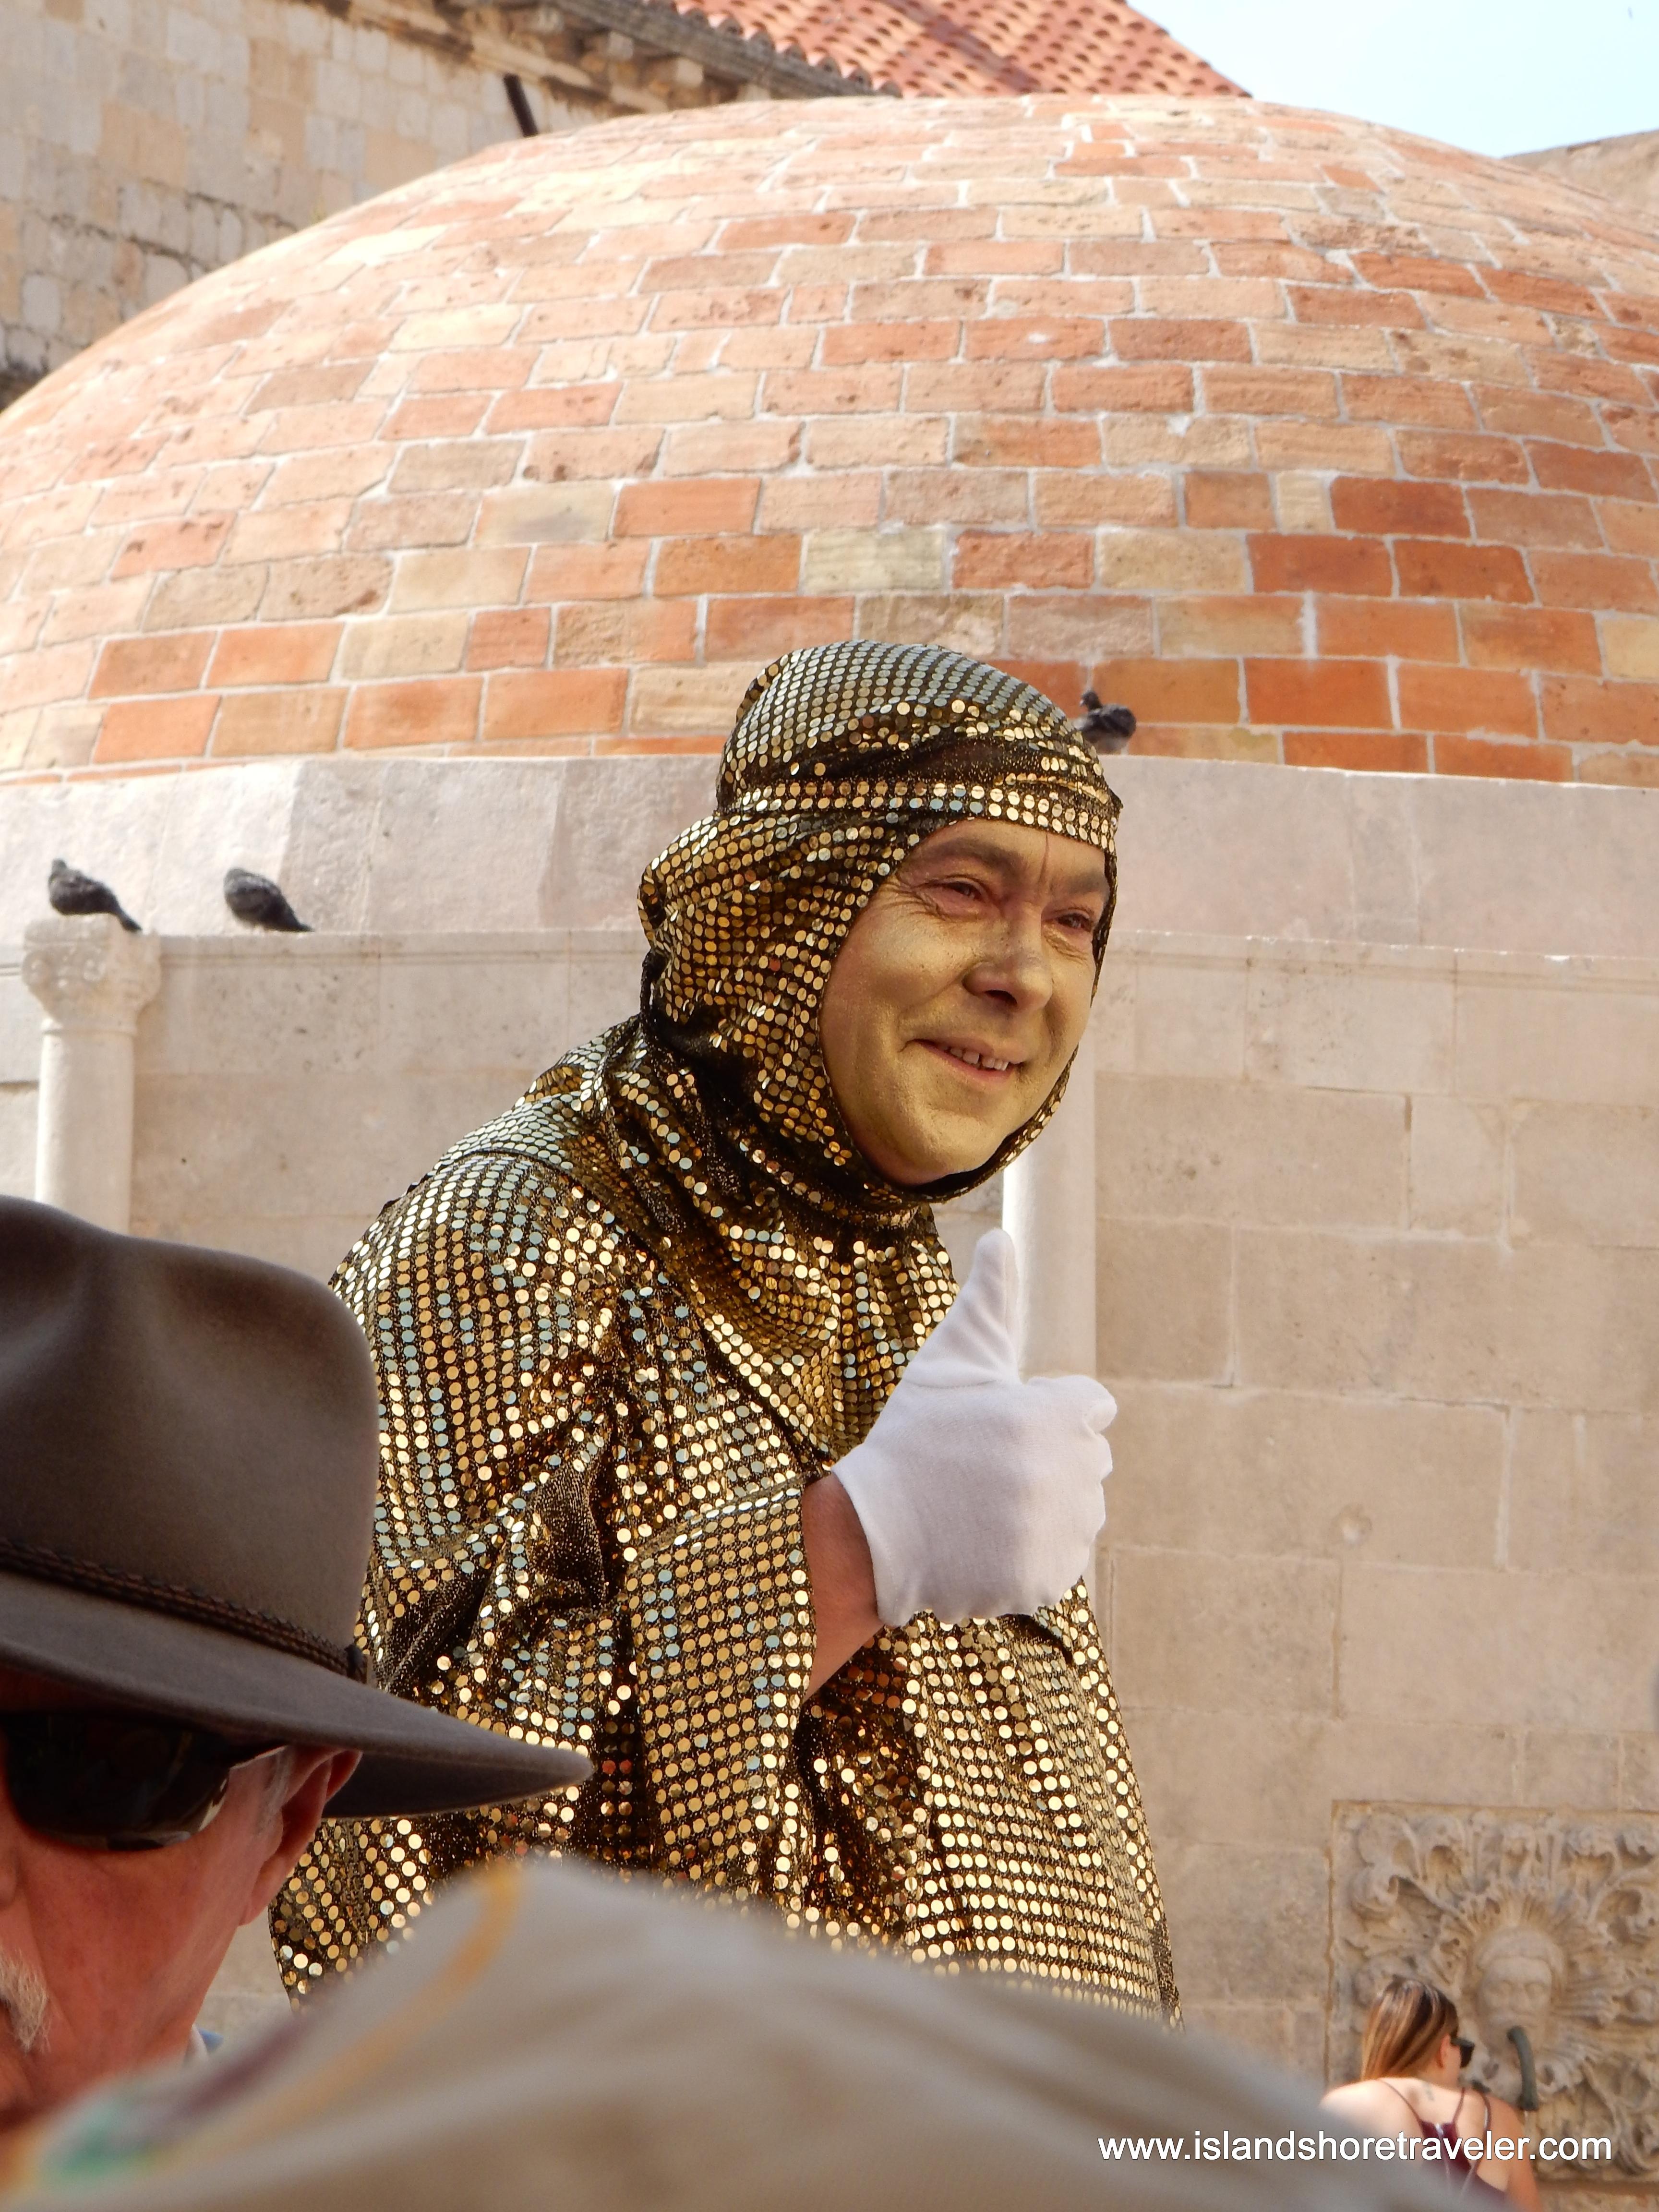 Busker/Street Performer in Dubrovnik